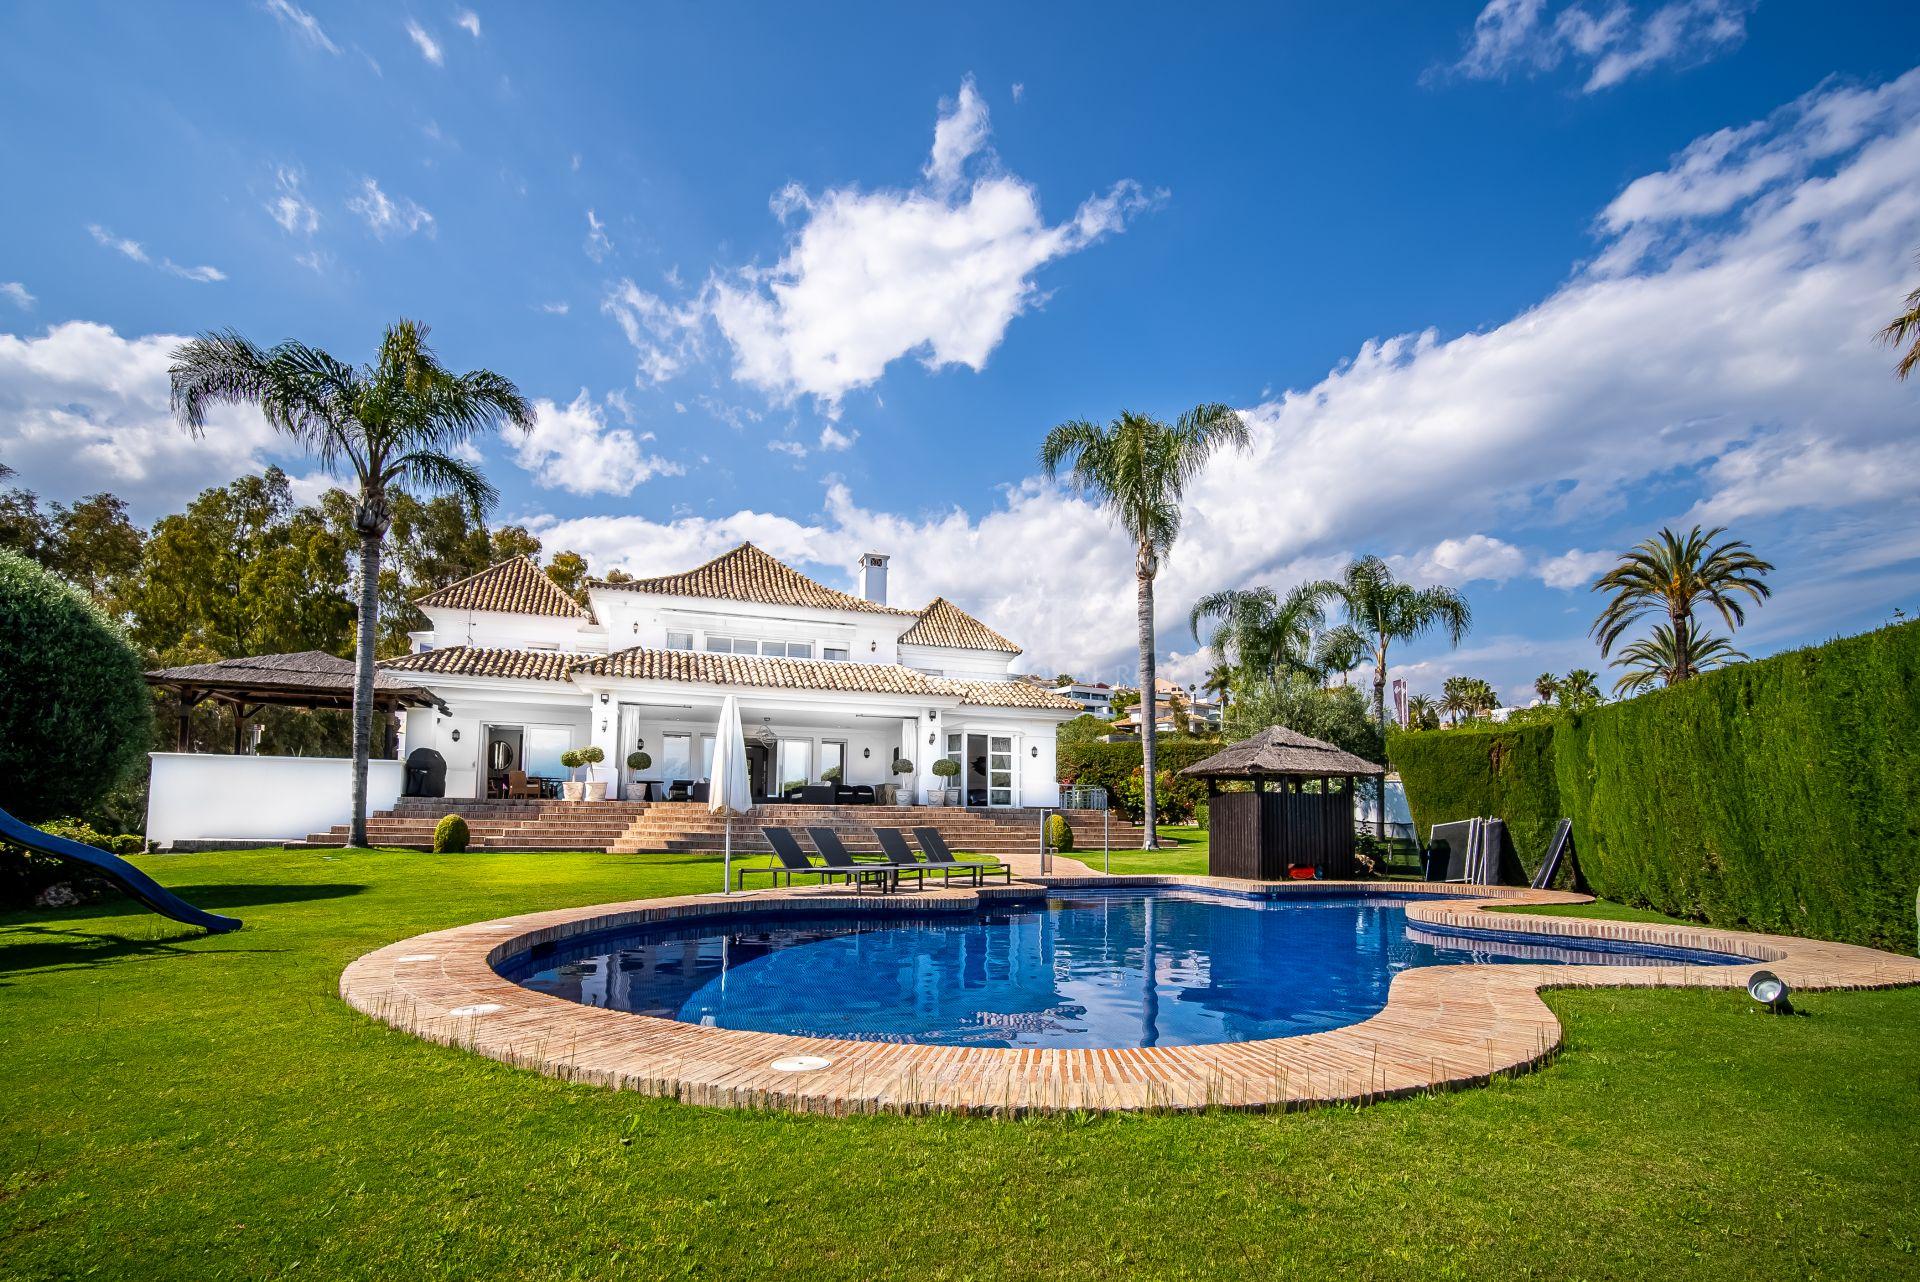 Majestic Villa in Nueva Andalucía, Marbella   Christie's International Real Estate